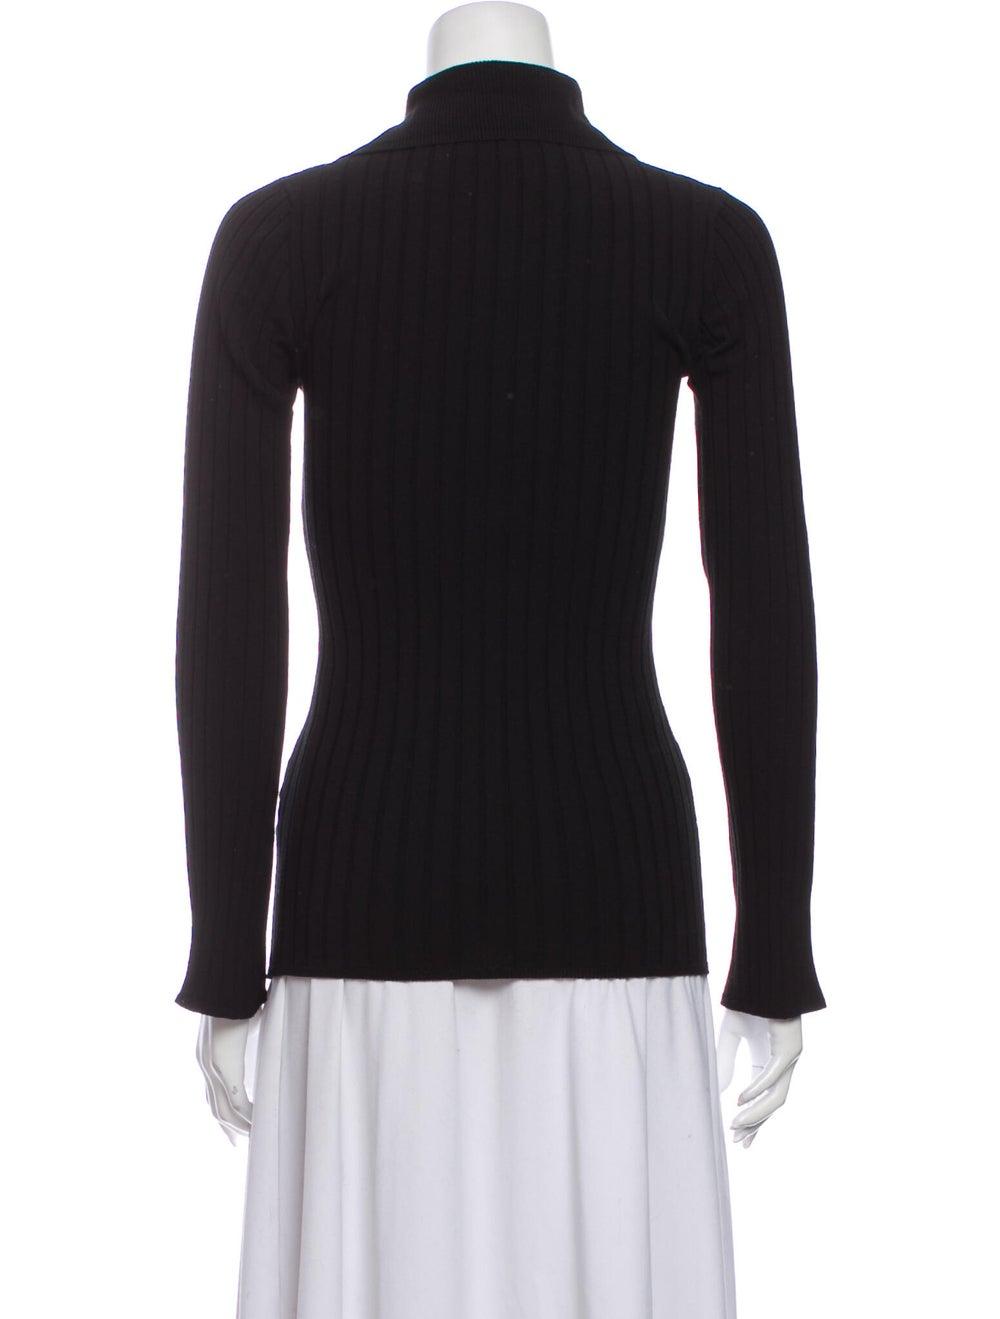 Ellery Striped Mock Neck Sweater Black - image 3